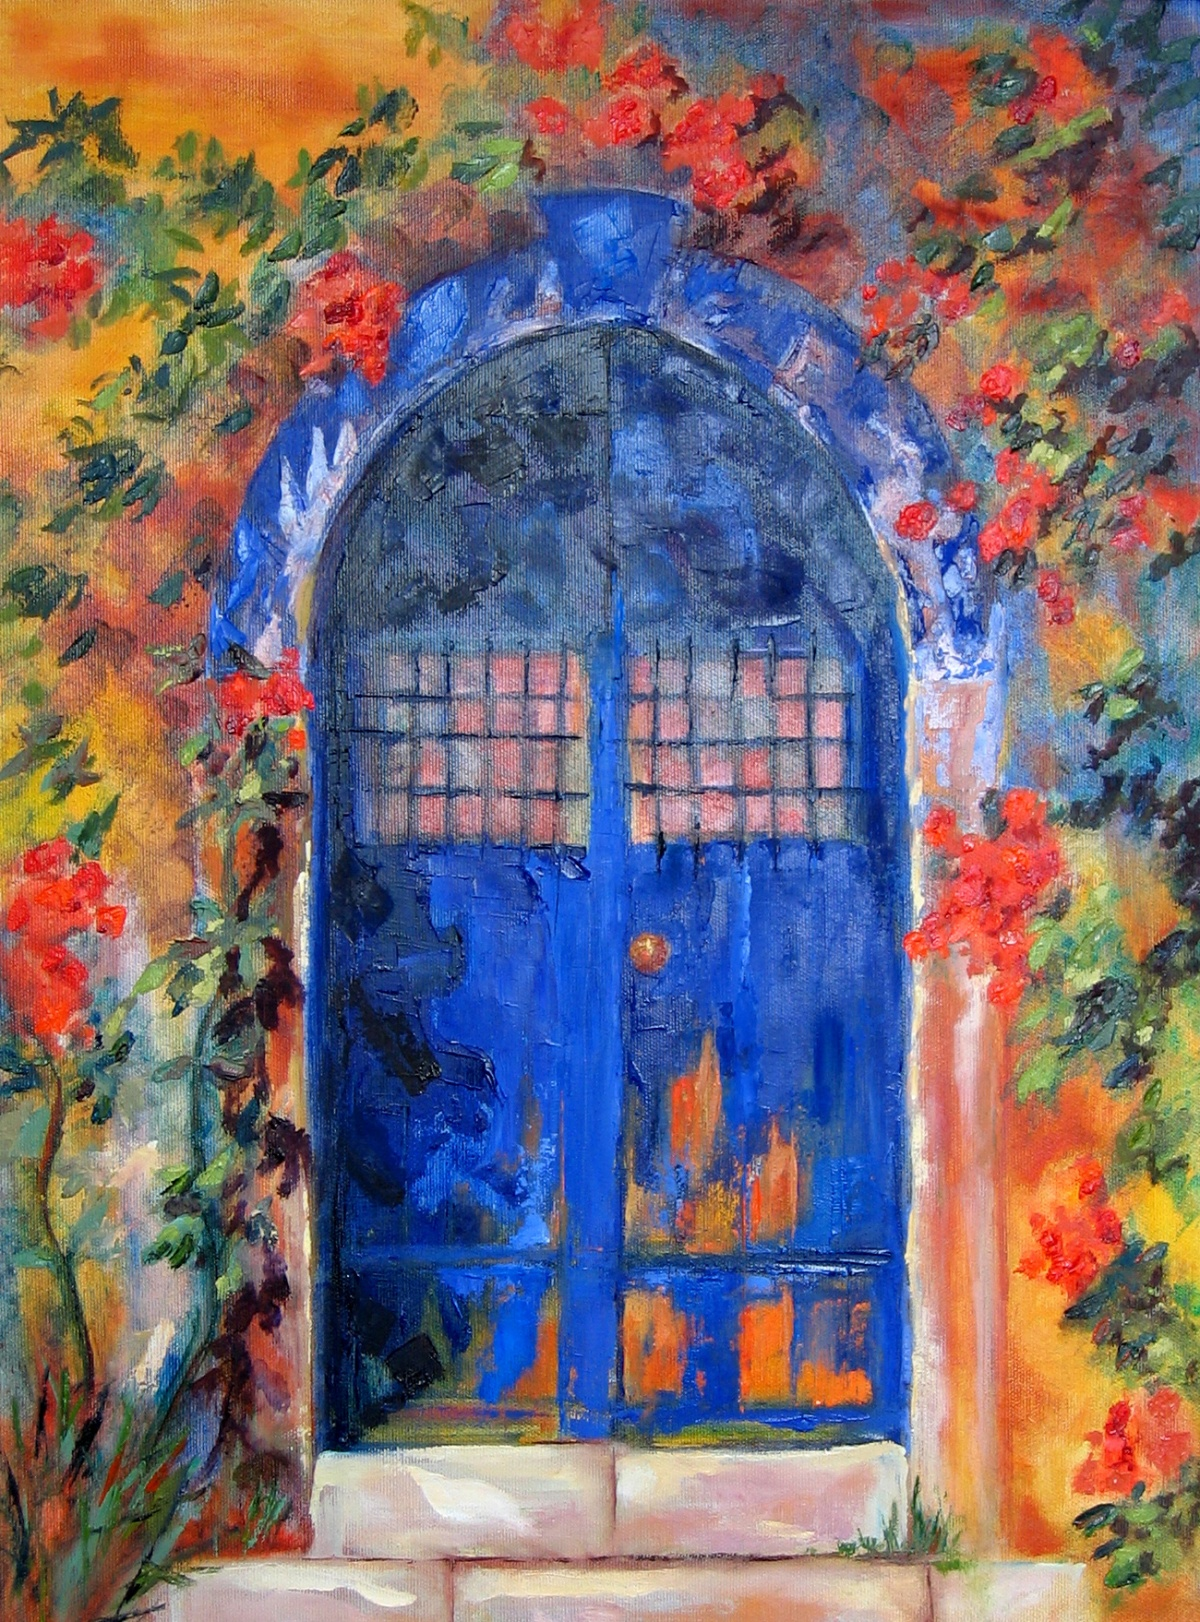 mallorca-door-oil-on-canvas-46cm-x-60cm